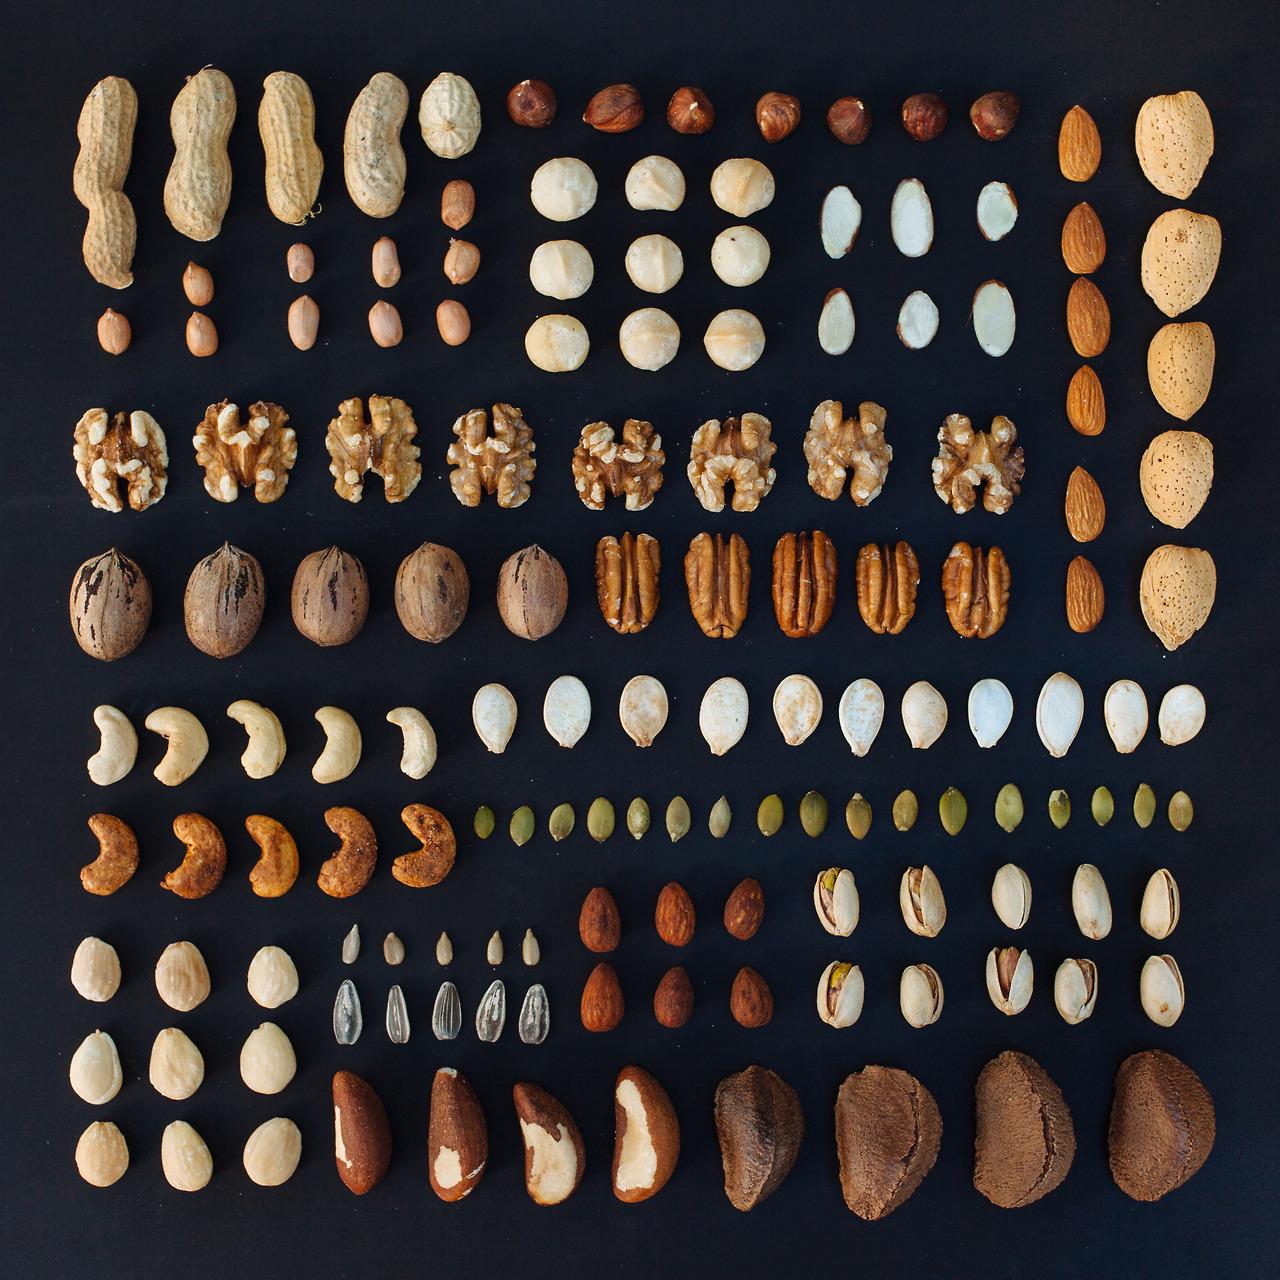 emily-blincoe-8-photos-instantanees-noix-noisettes-cacahuetes